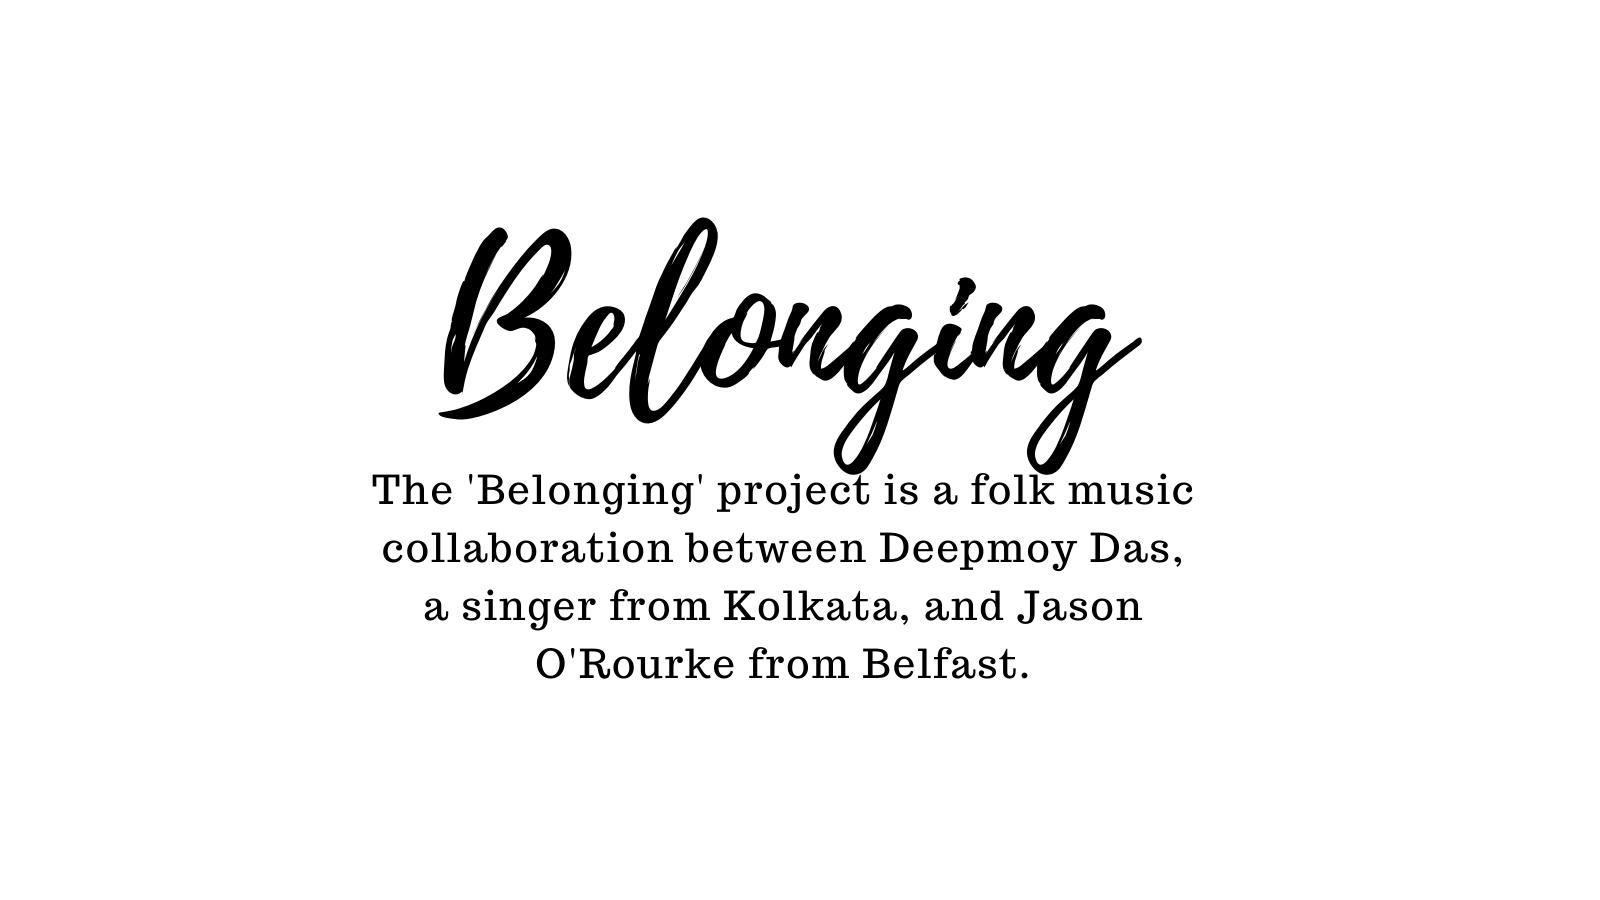 'Belonging': A Belfast-Kolkata Musical Collaboration